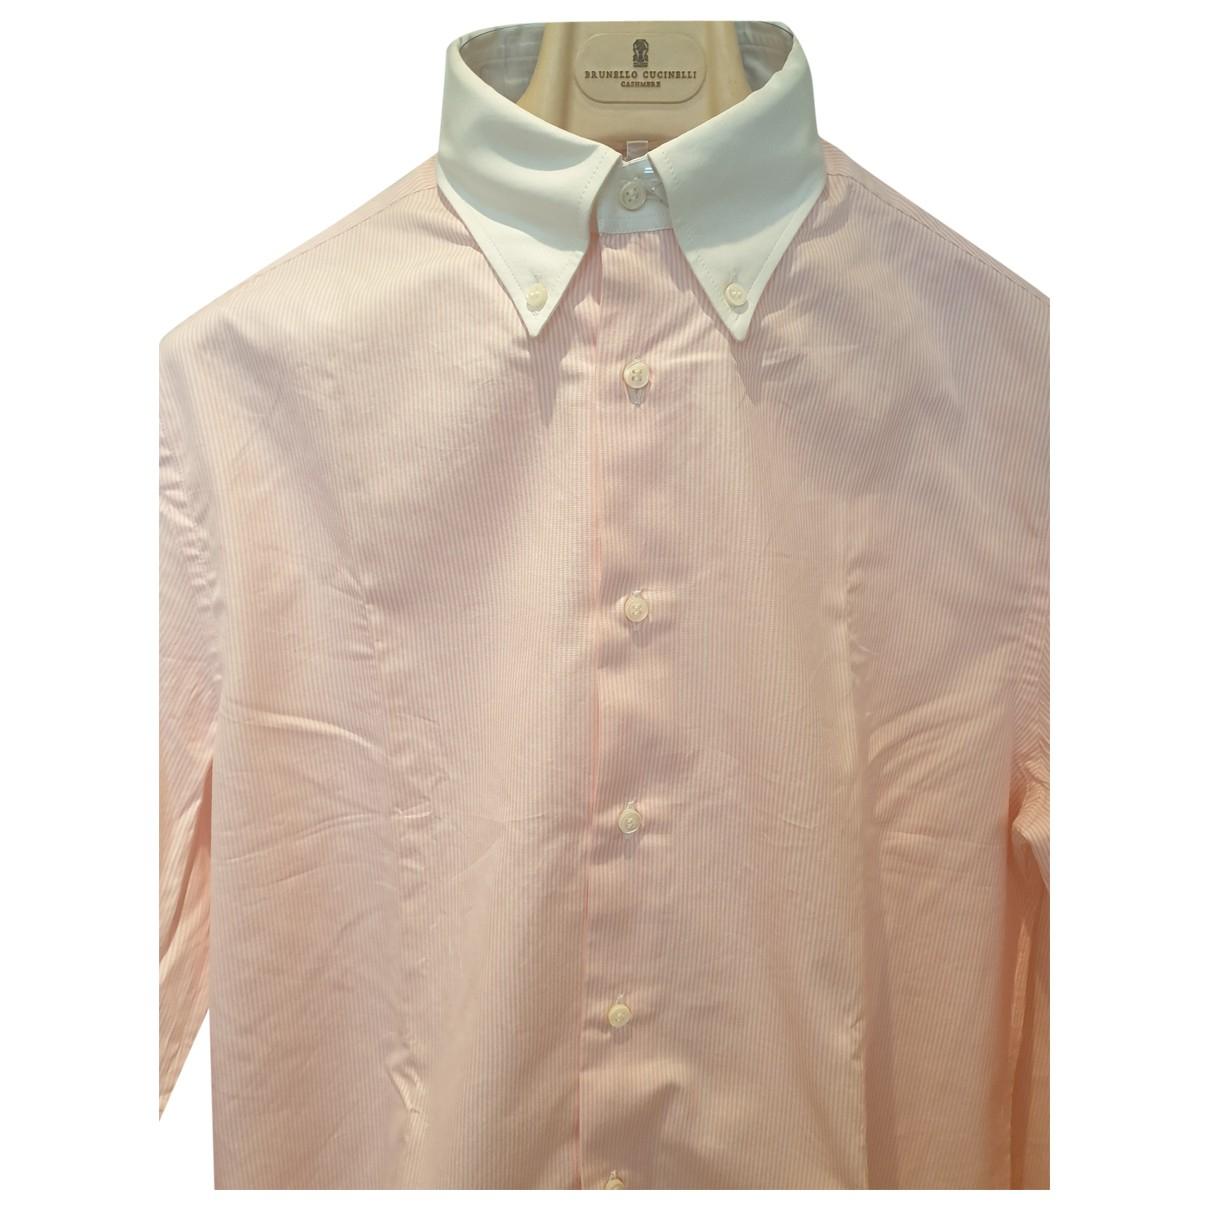 Brunello Cucinelli \N Pink Cotton Shirts for Men L International